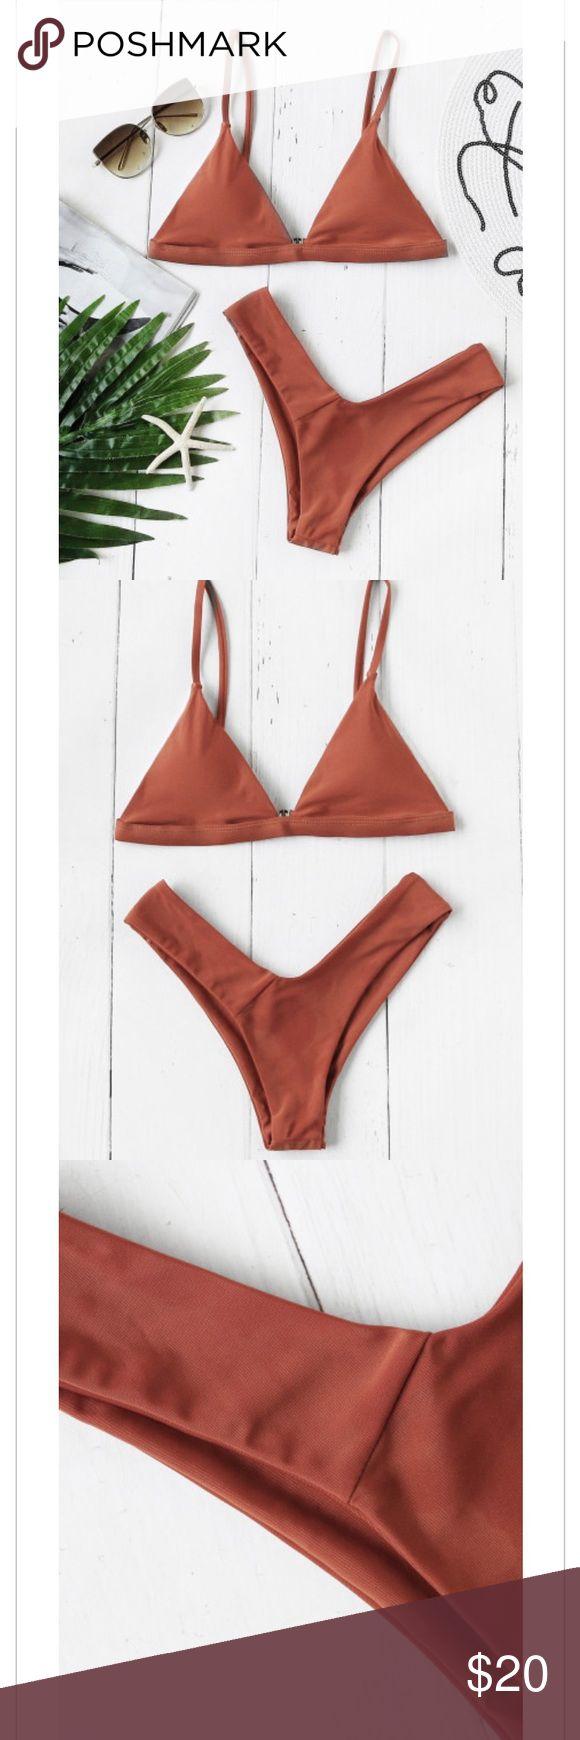 ROMWE burnt orange triangle bikini Size M. Cheeky bottoms. BRAND NEW!!!! ROMWE Swim Bikinis